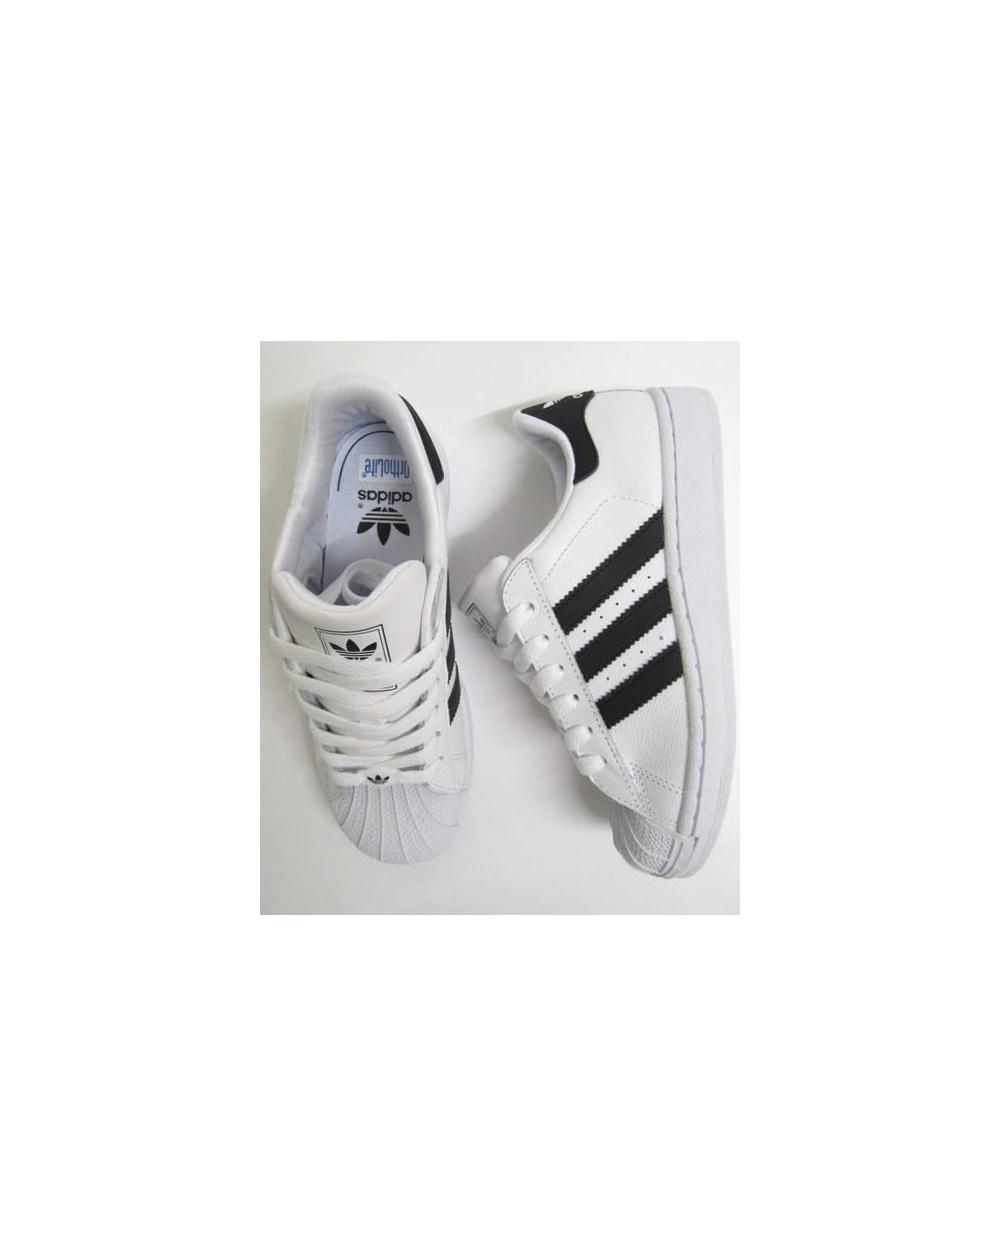 Adidas Superstar Tamaño Blanco Y Negro 2 t0u2rOfWTR